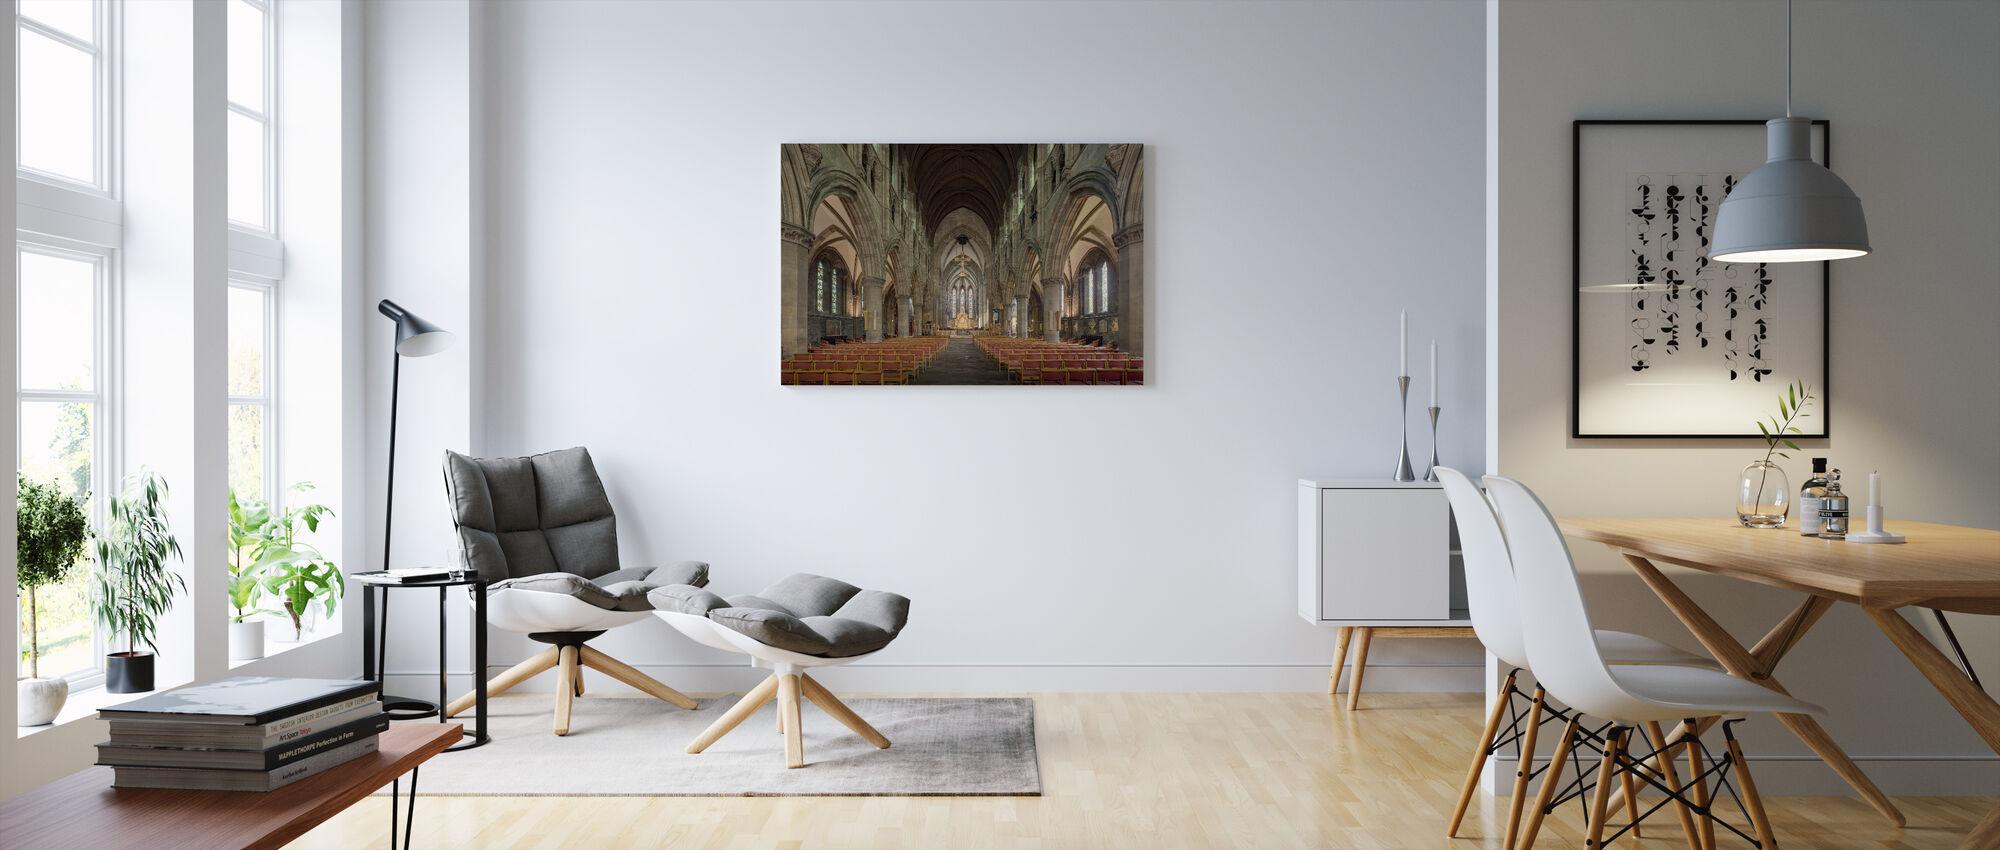 St Marys Church - Canvas print - Living Room